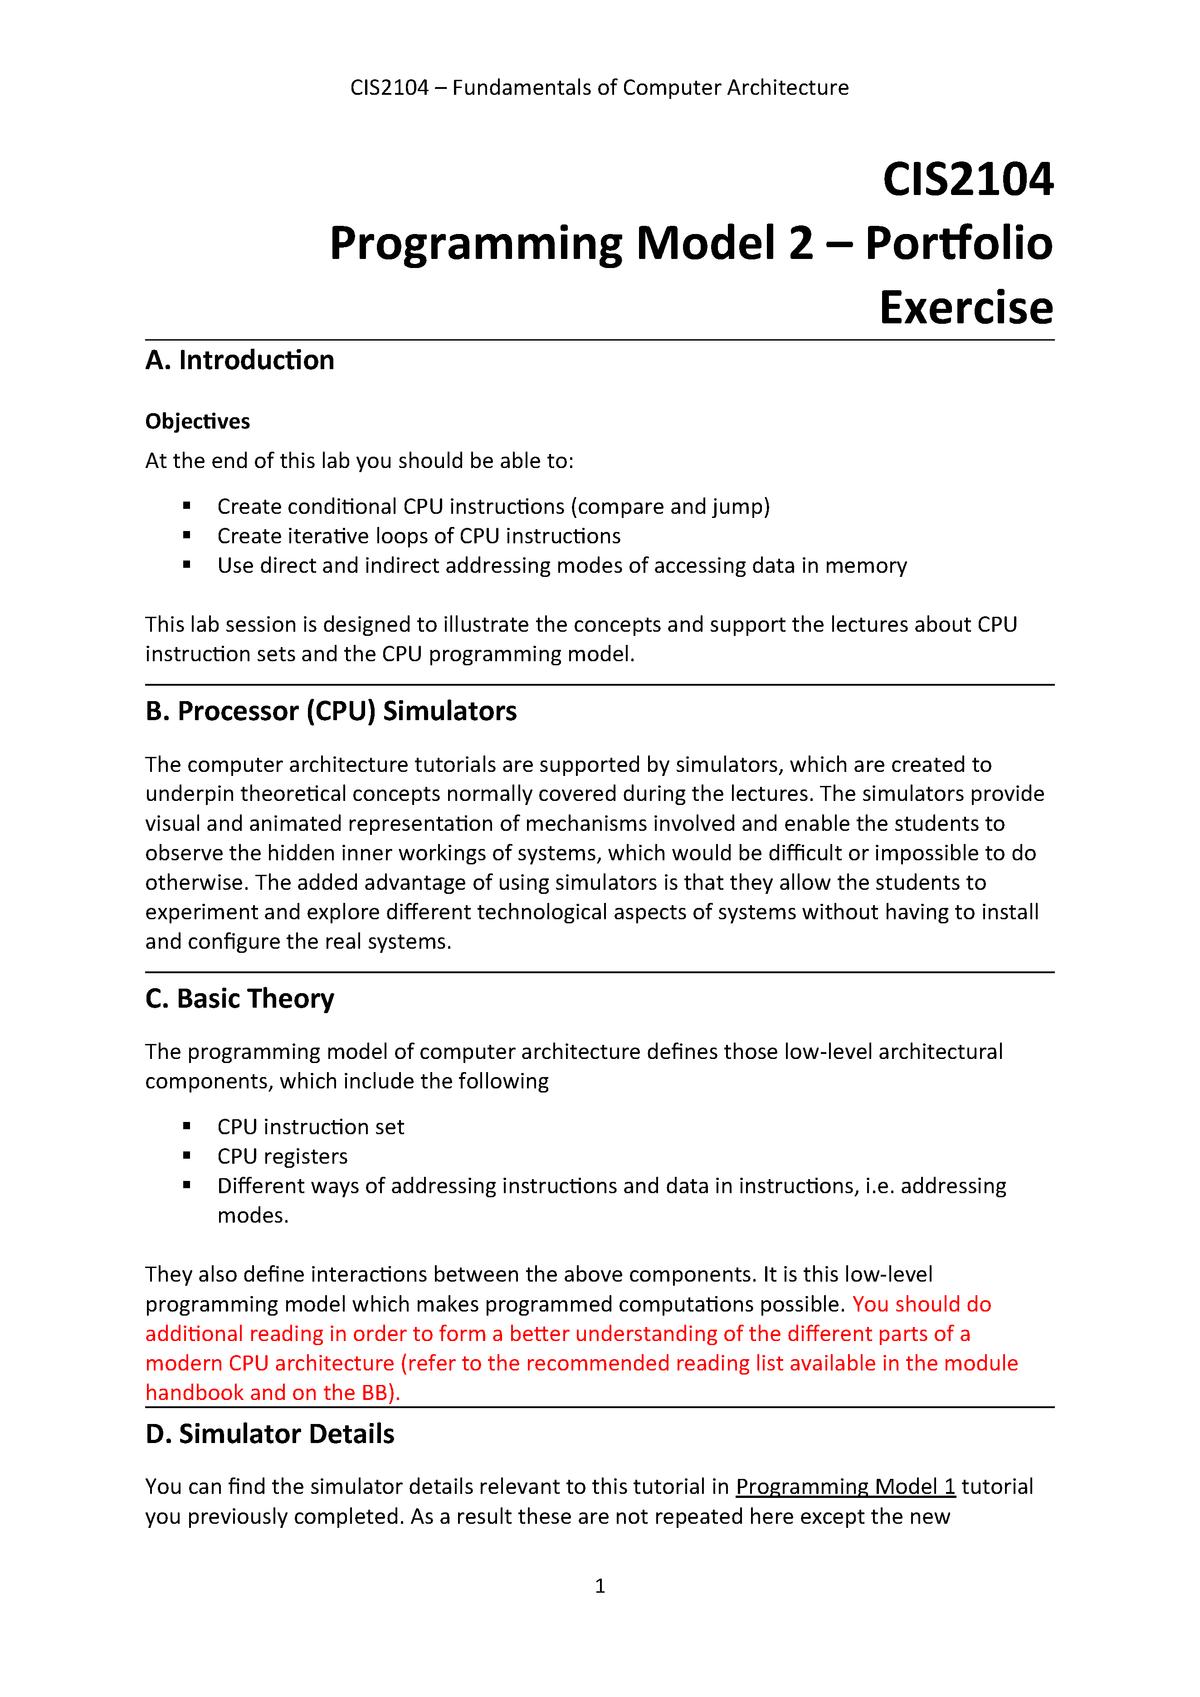 P1 Programming Model 2 Tutorial - CIS2153: Computer Systems